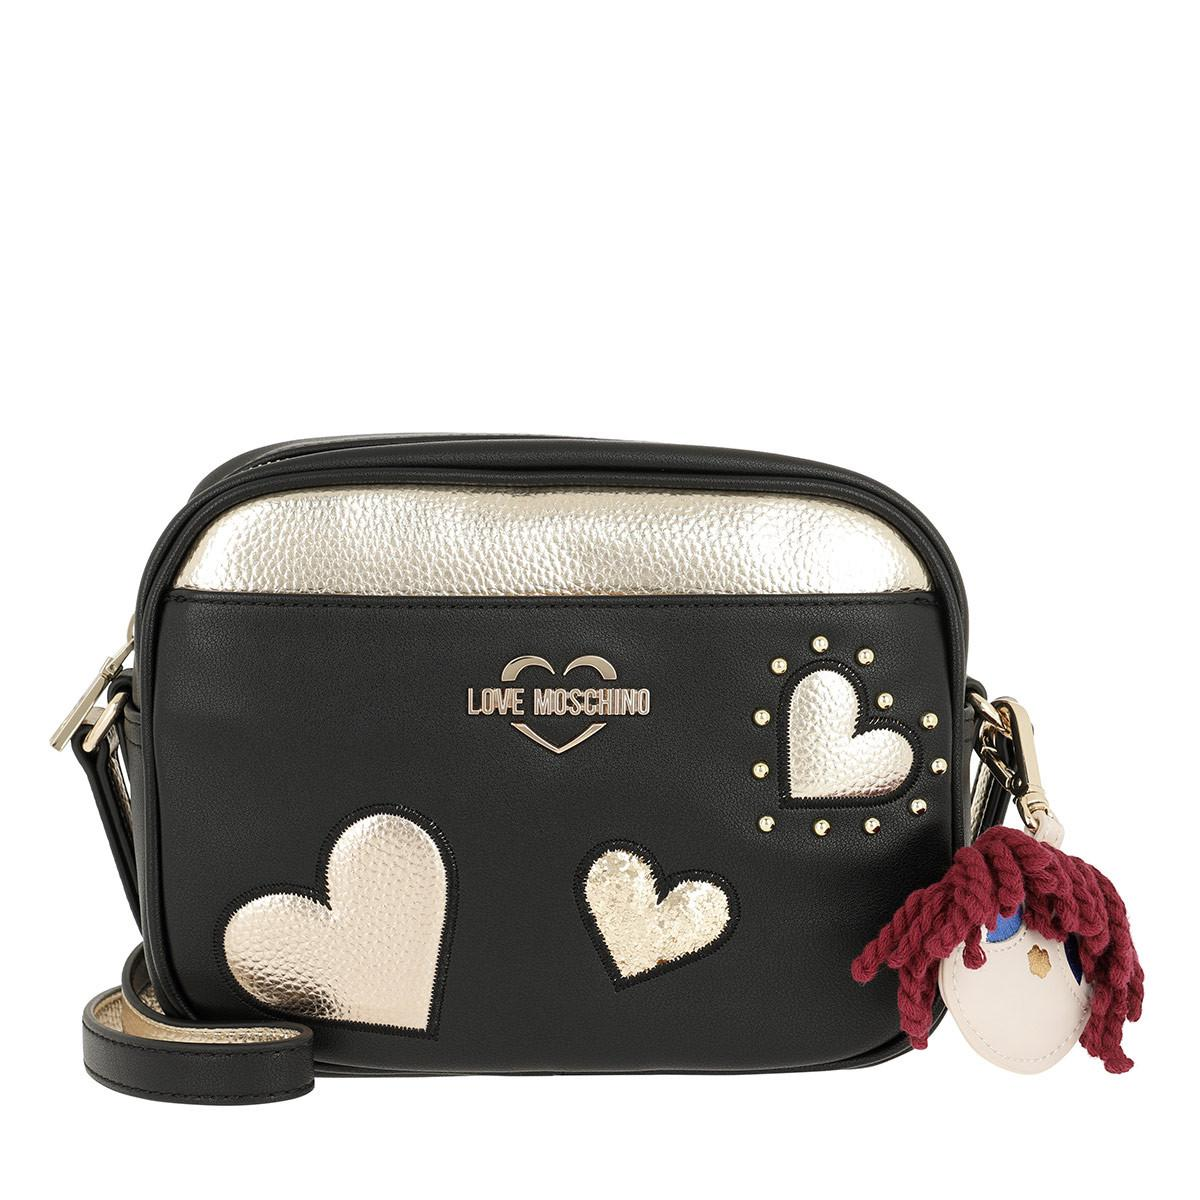 e03e4e31df Damentaschen LOVE MOSCHINO Black Grained Cross Body Bag